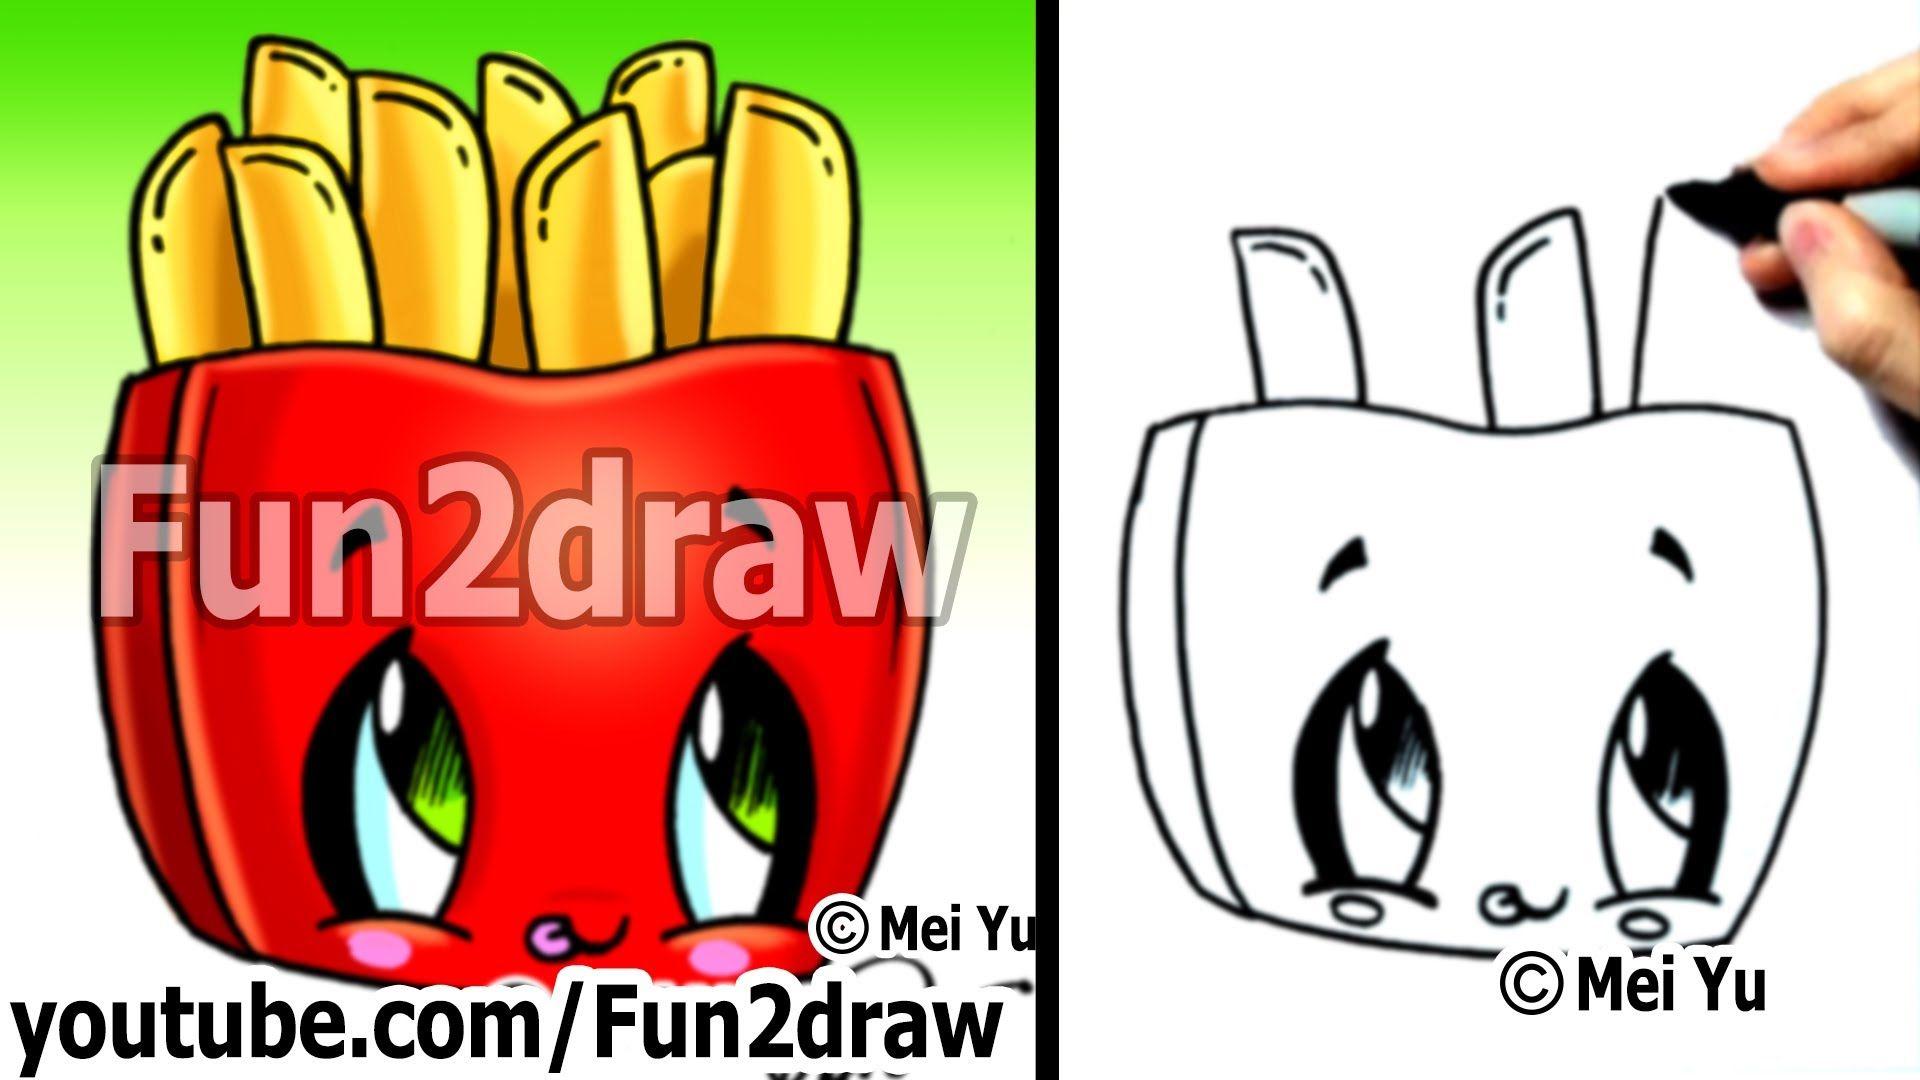 Kawaii Tutorial How To Draw Kawaii Food Fries Cute Easy Drawing Cute Art Fun2draw Fun2draw Cute Easy Drawings Easy Drawings